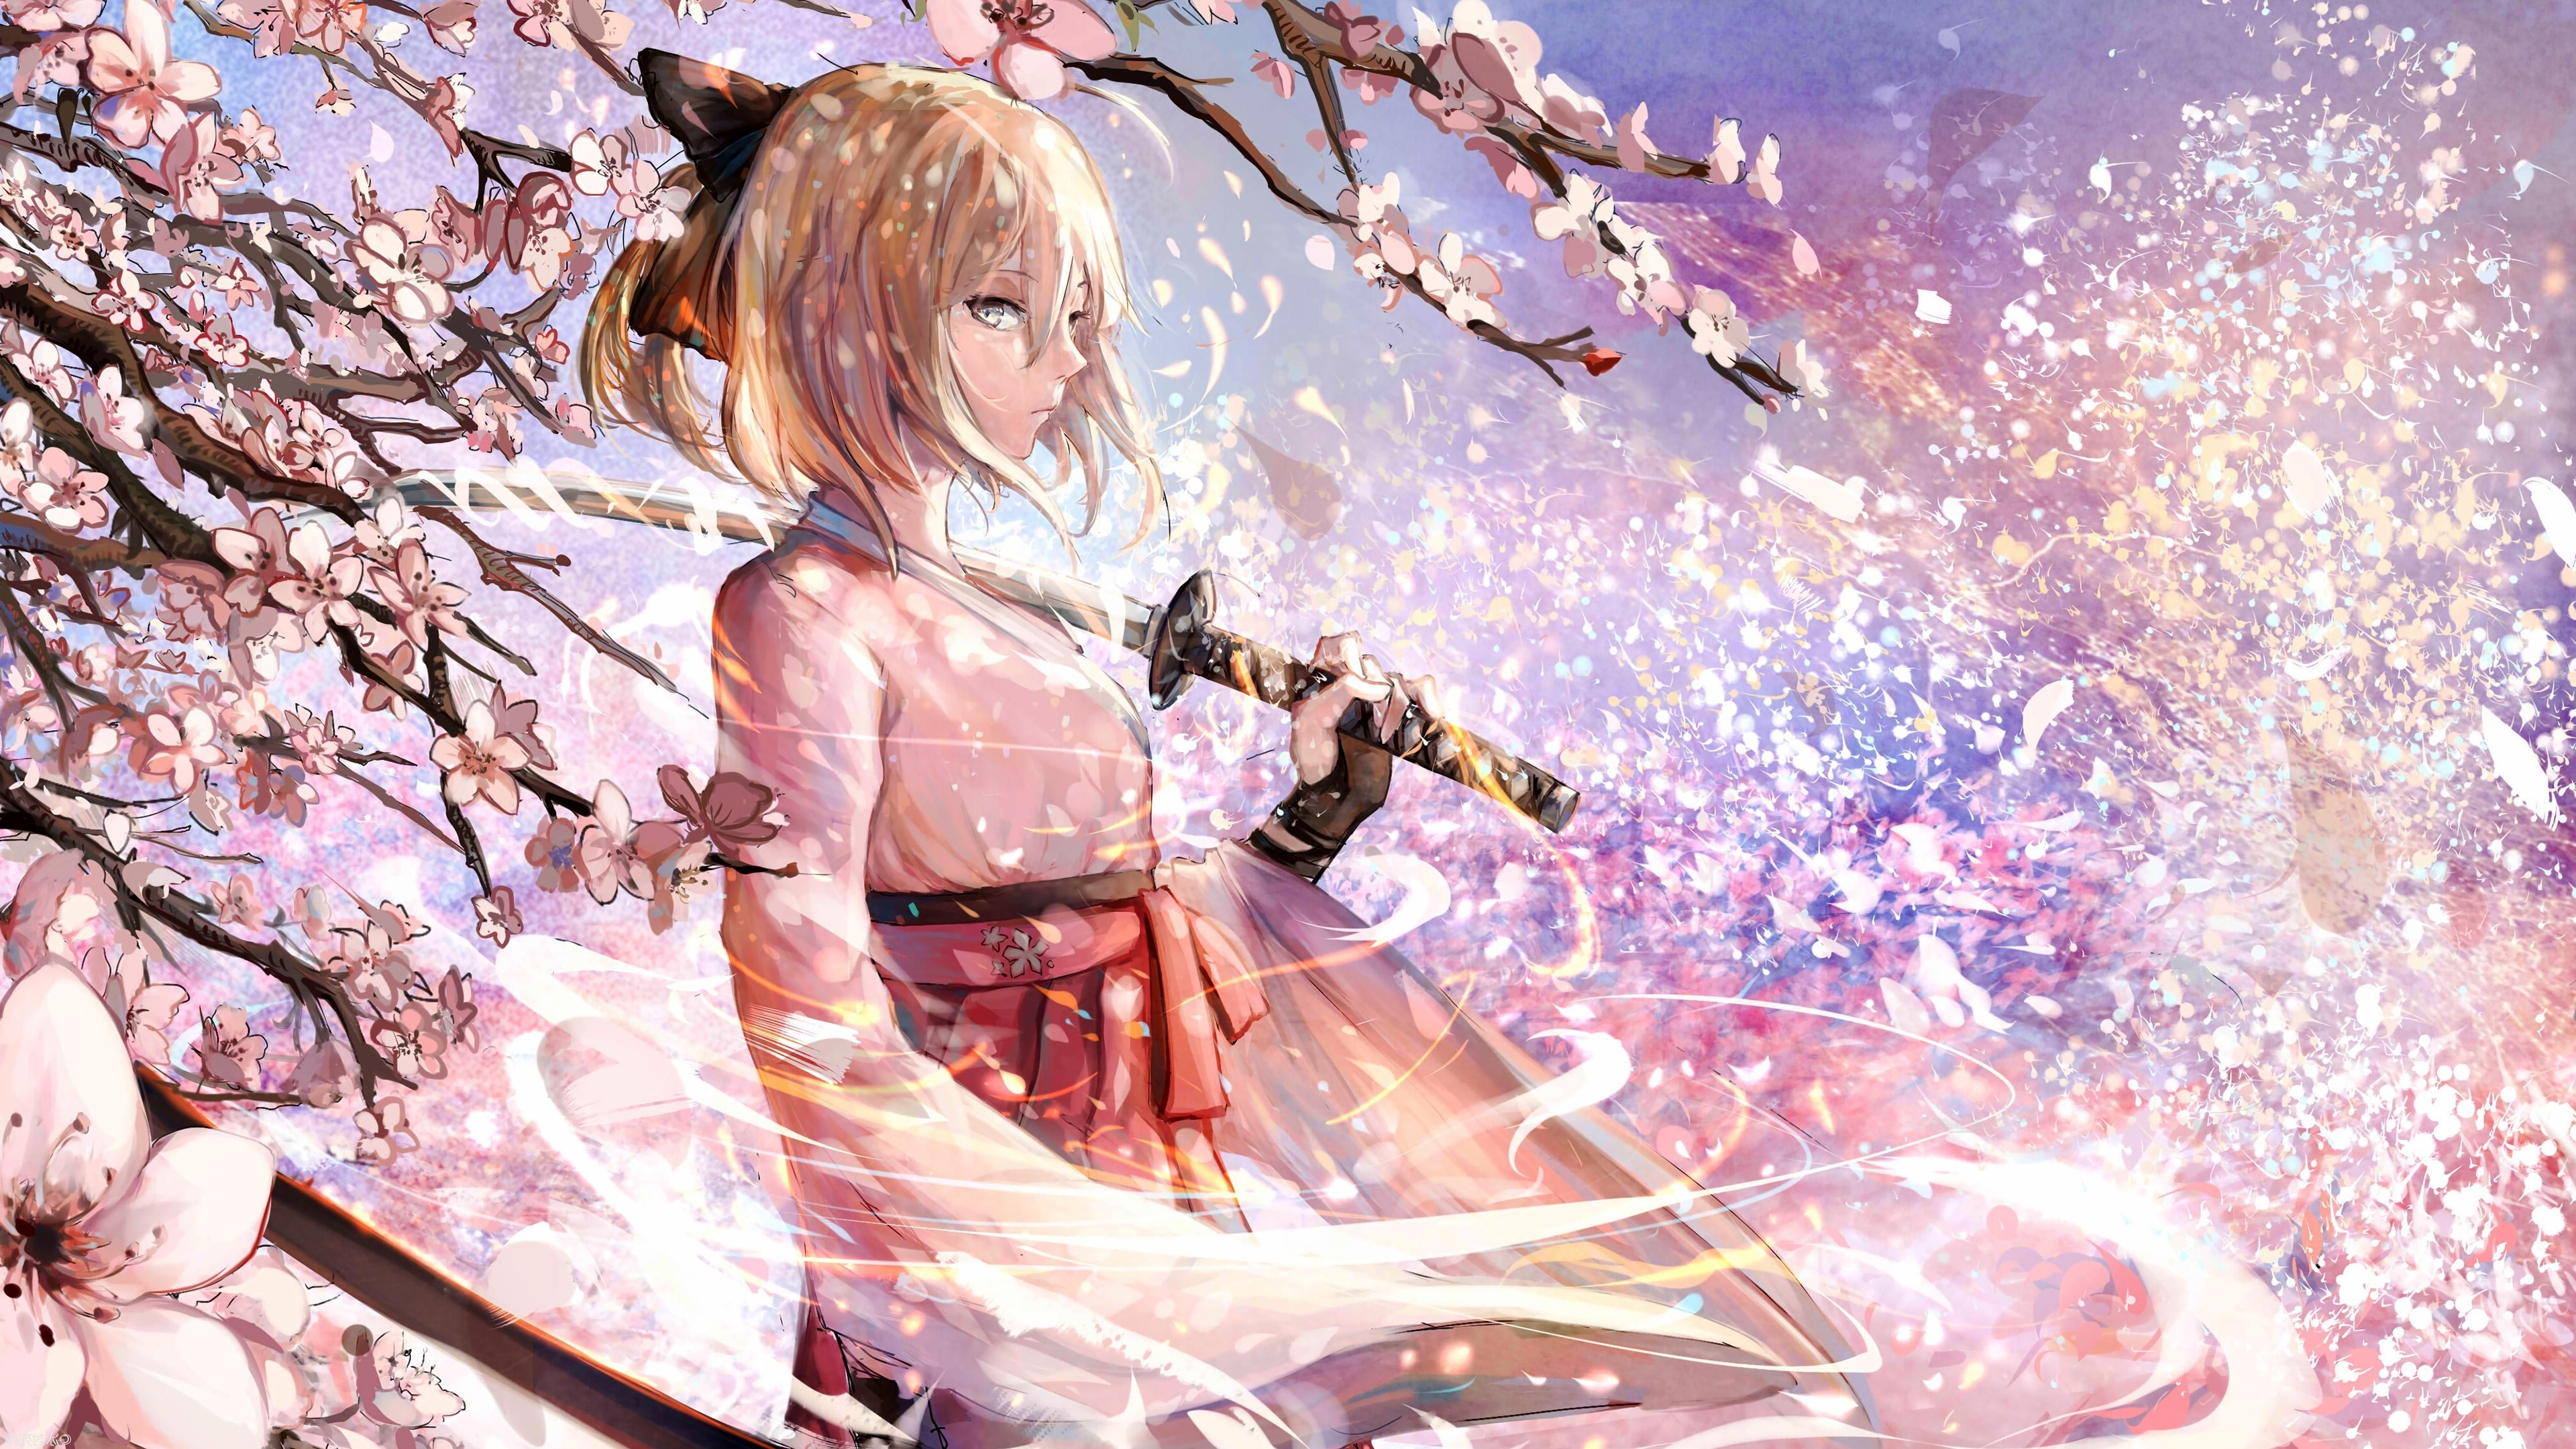 Fate grand order anime girl with sword 4k hd anime 4k - Anime background wallpaper 4k ...